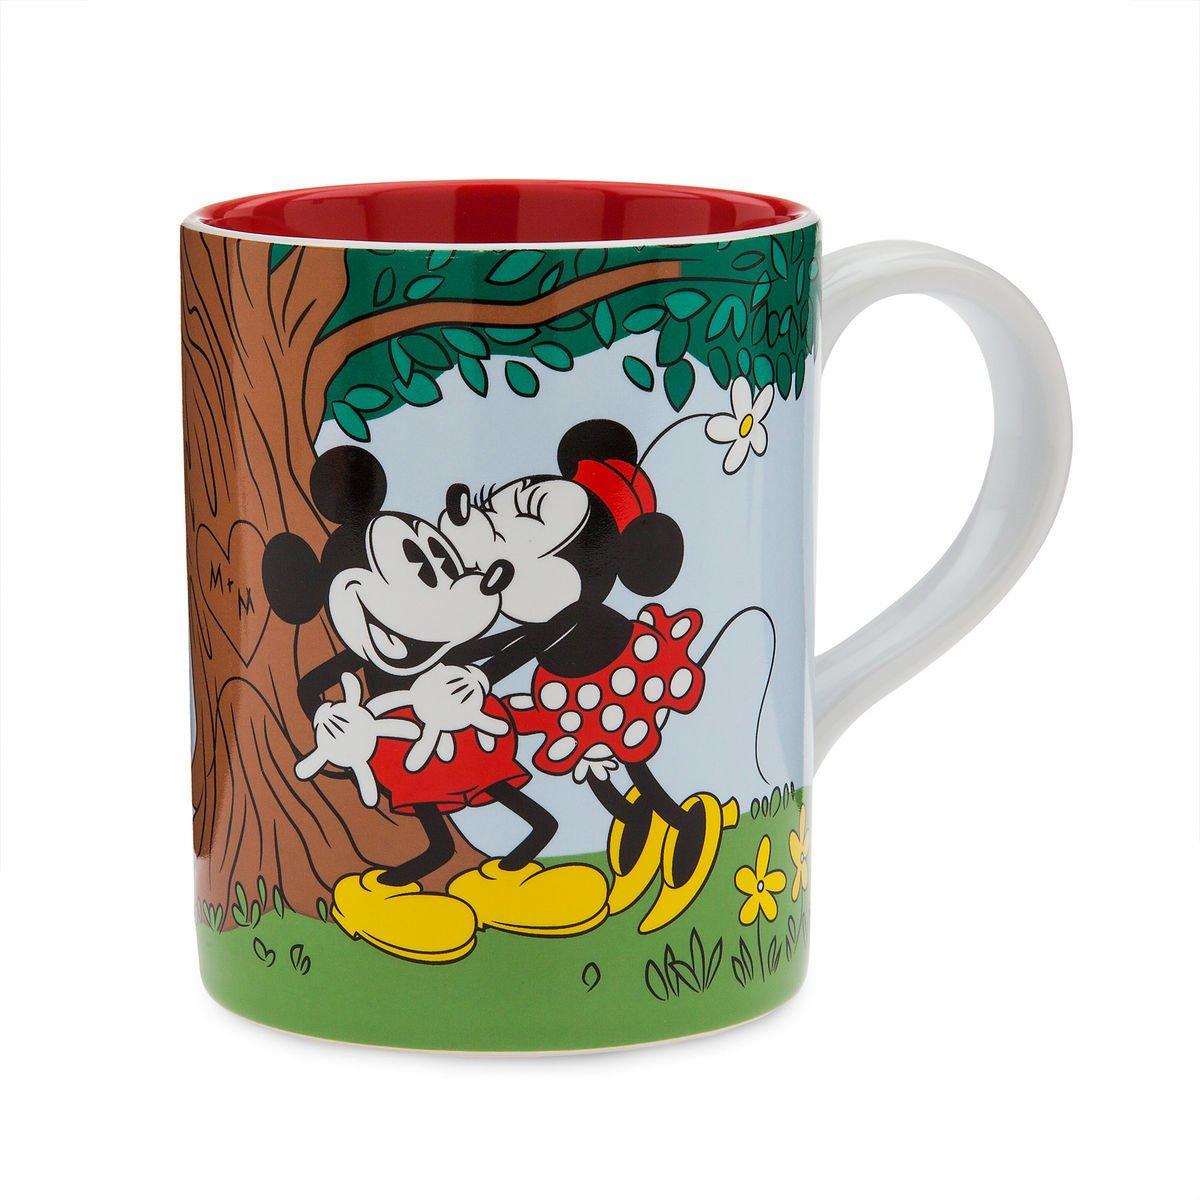 Disney Store Mickey and Minnie Mouse Picnic Kiss Mug New 2018